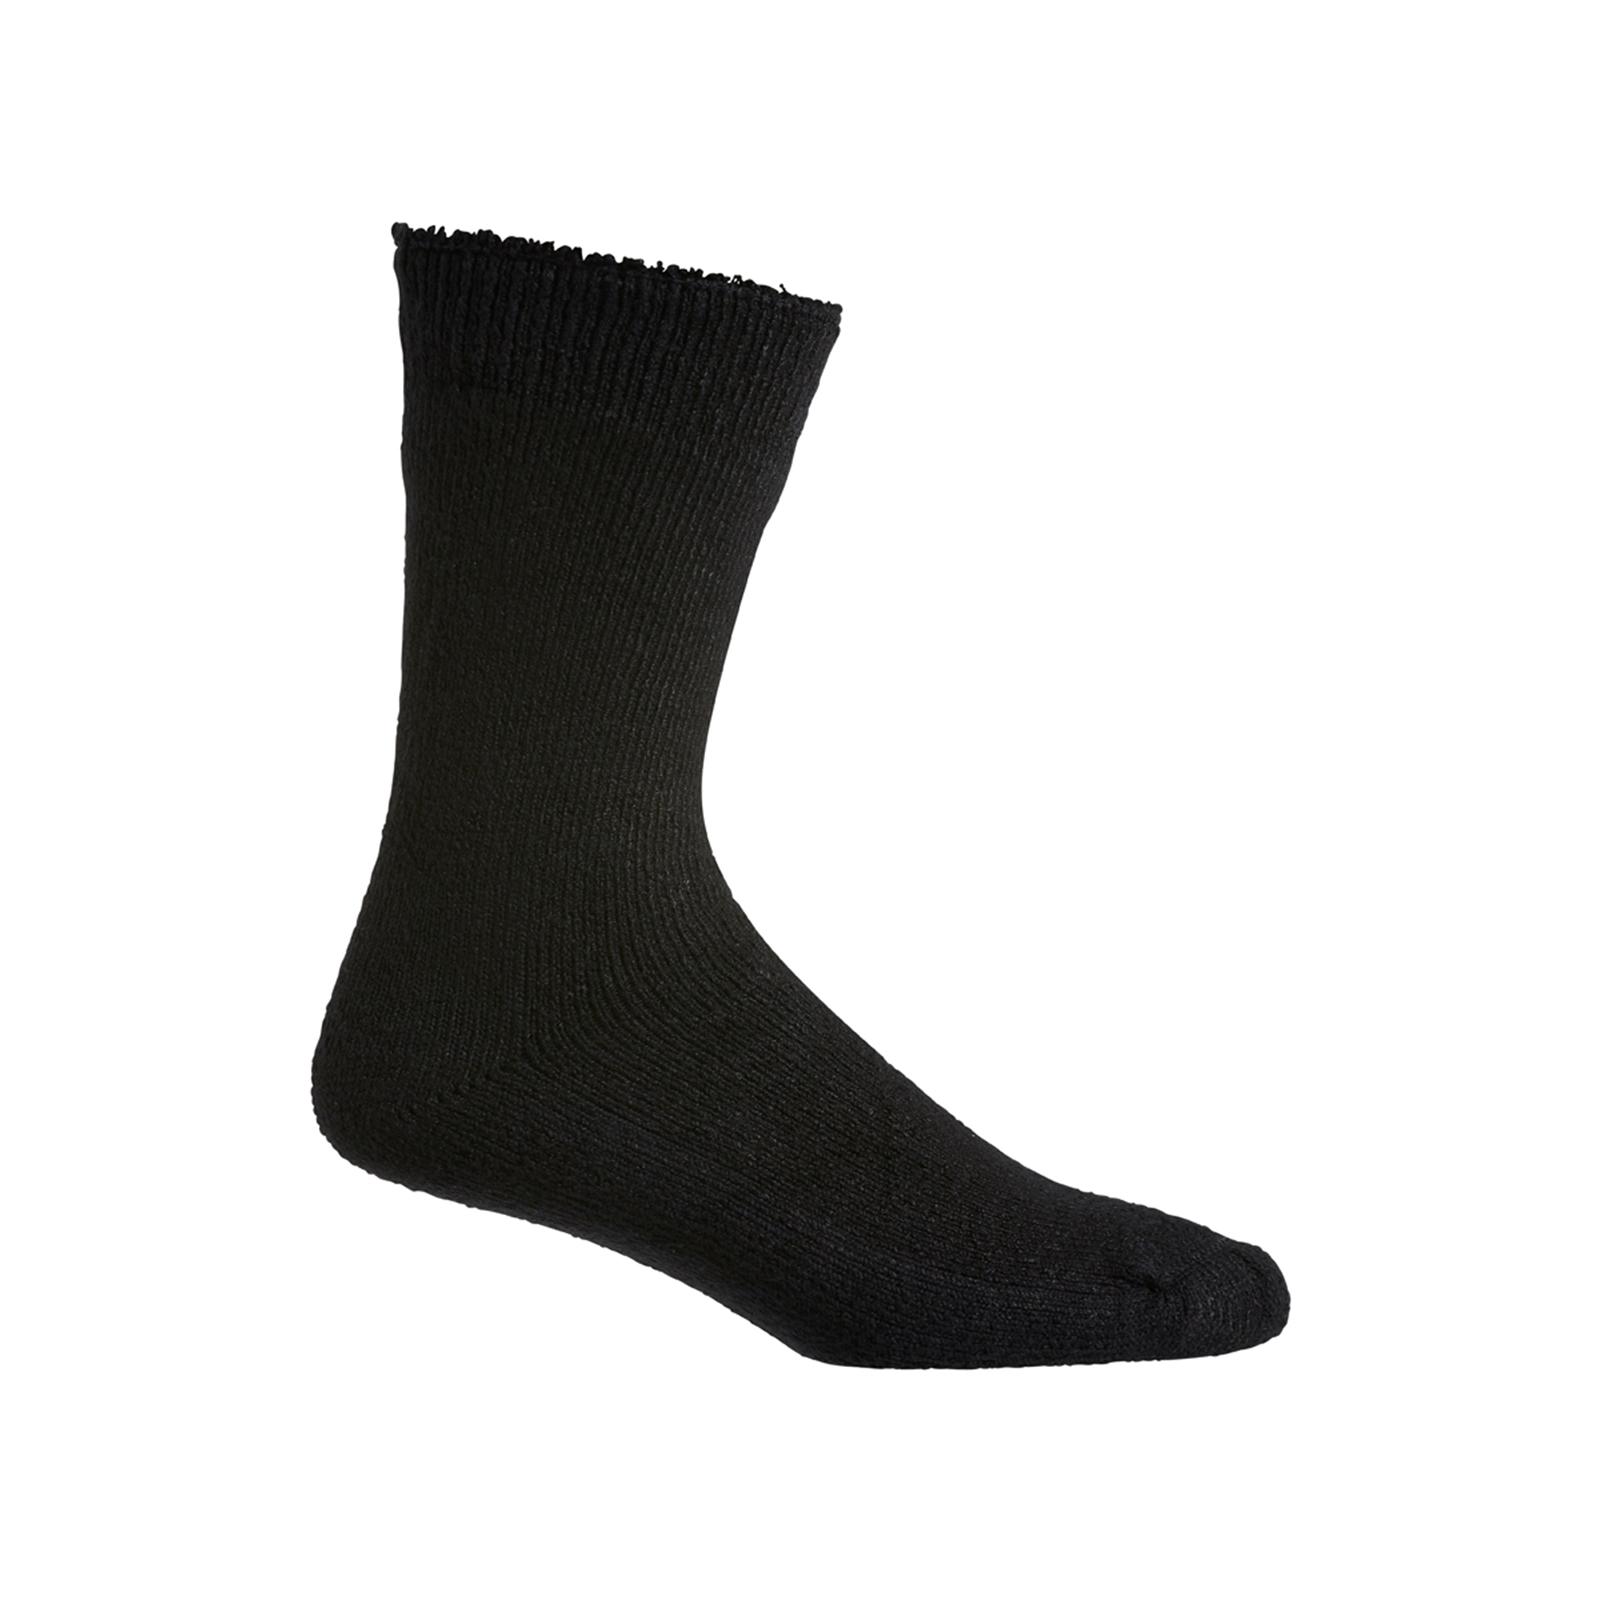 Hard Yakka 7-12 Black Bamboo Socks - 2 Pack